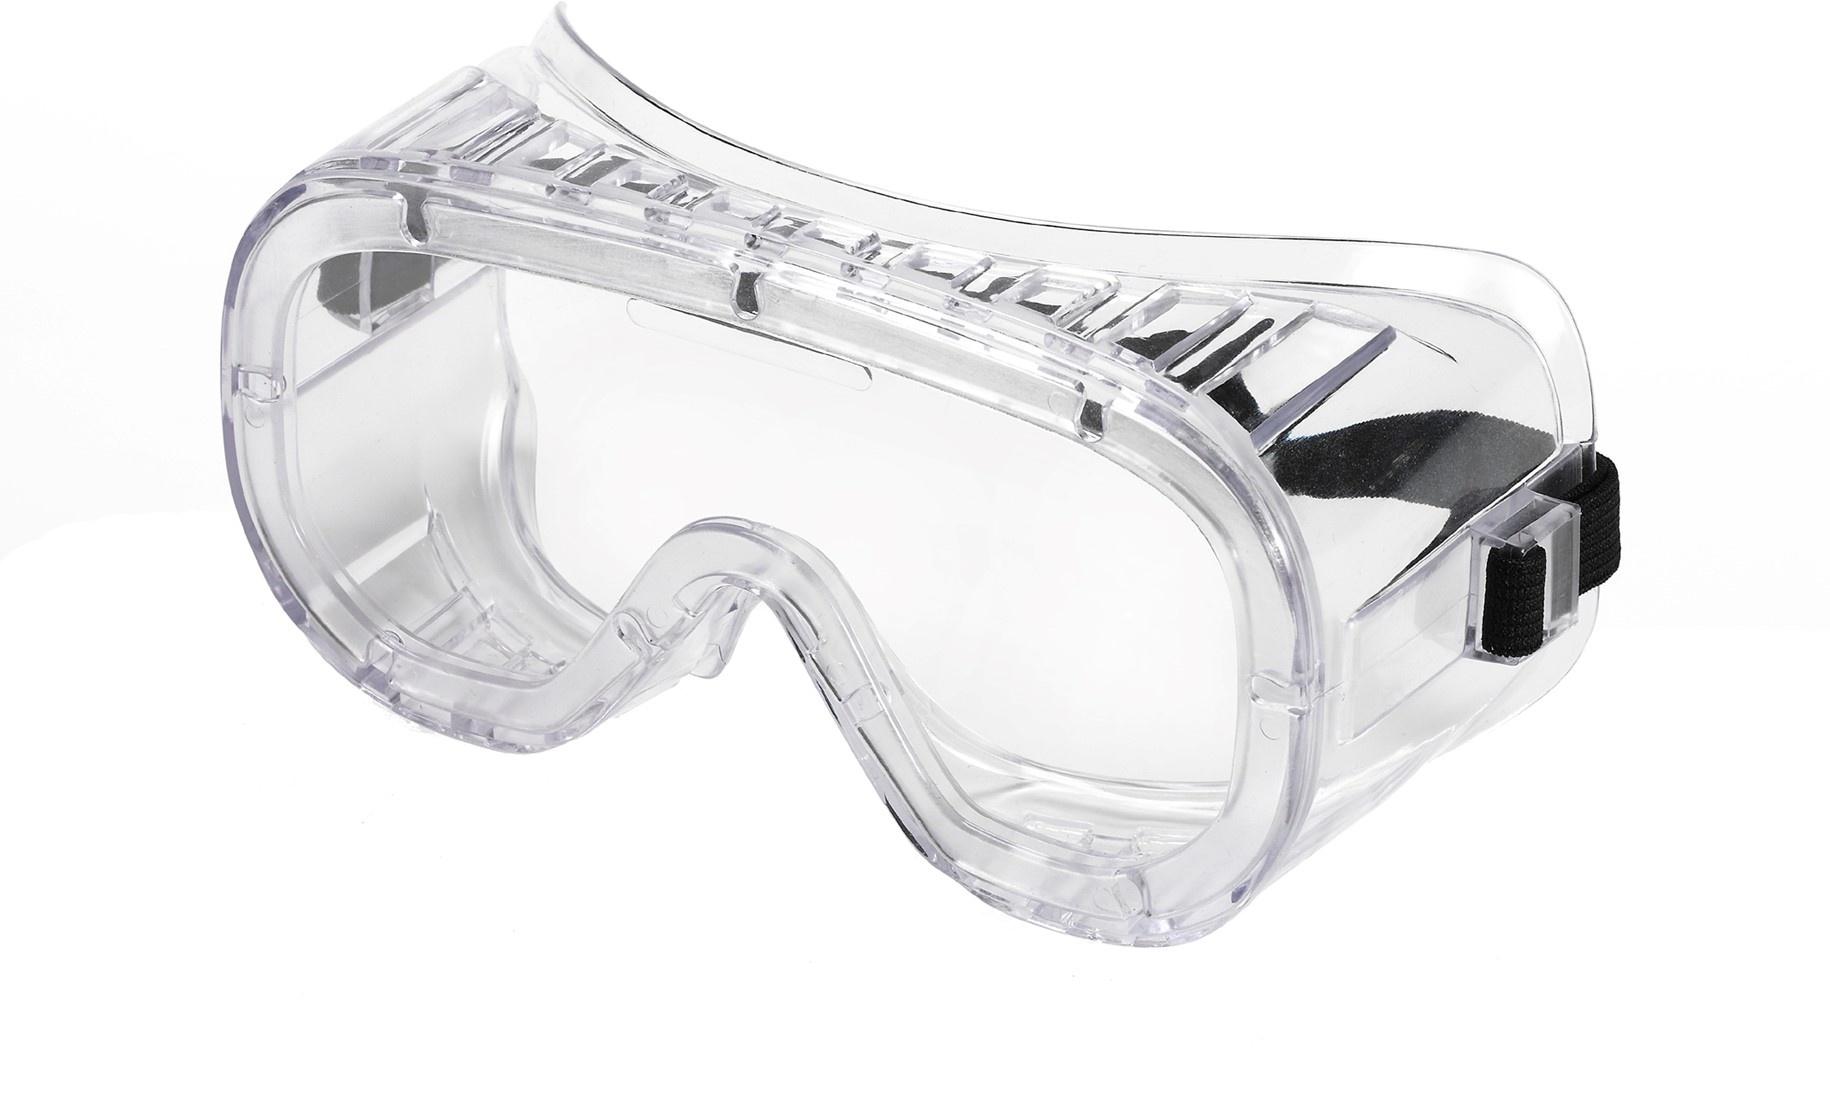 Univet Univet ruimzichtbril 602 helder anti-damp